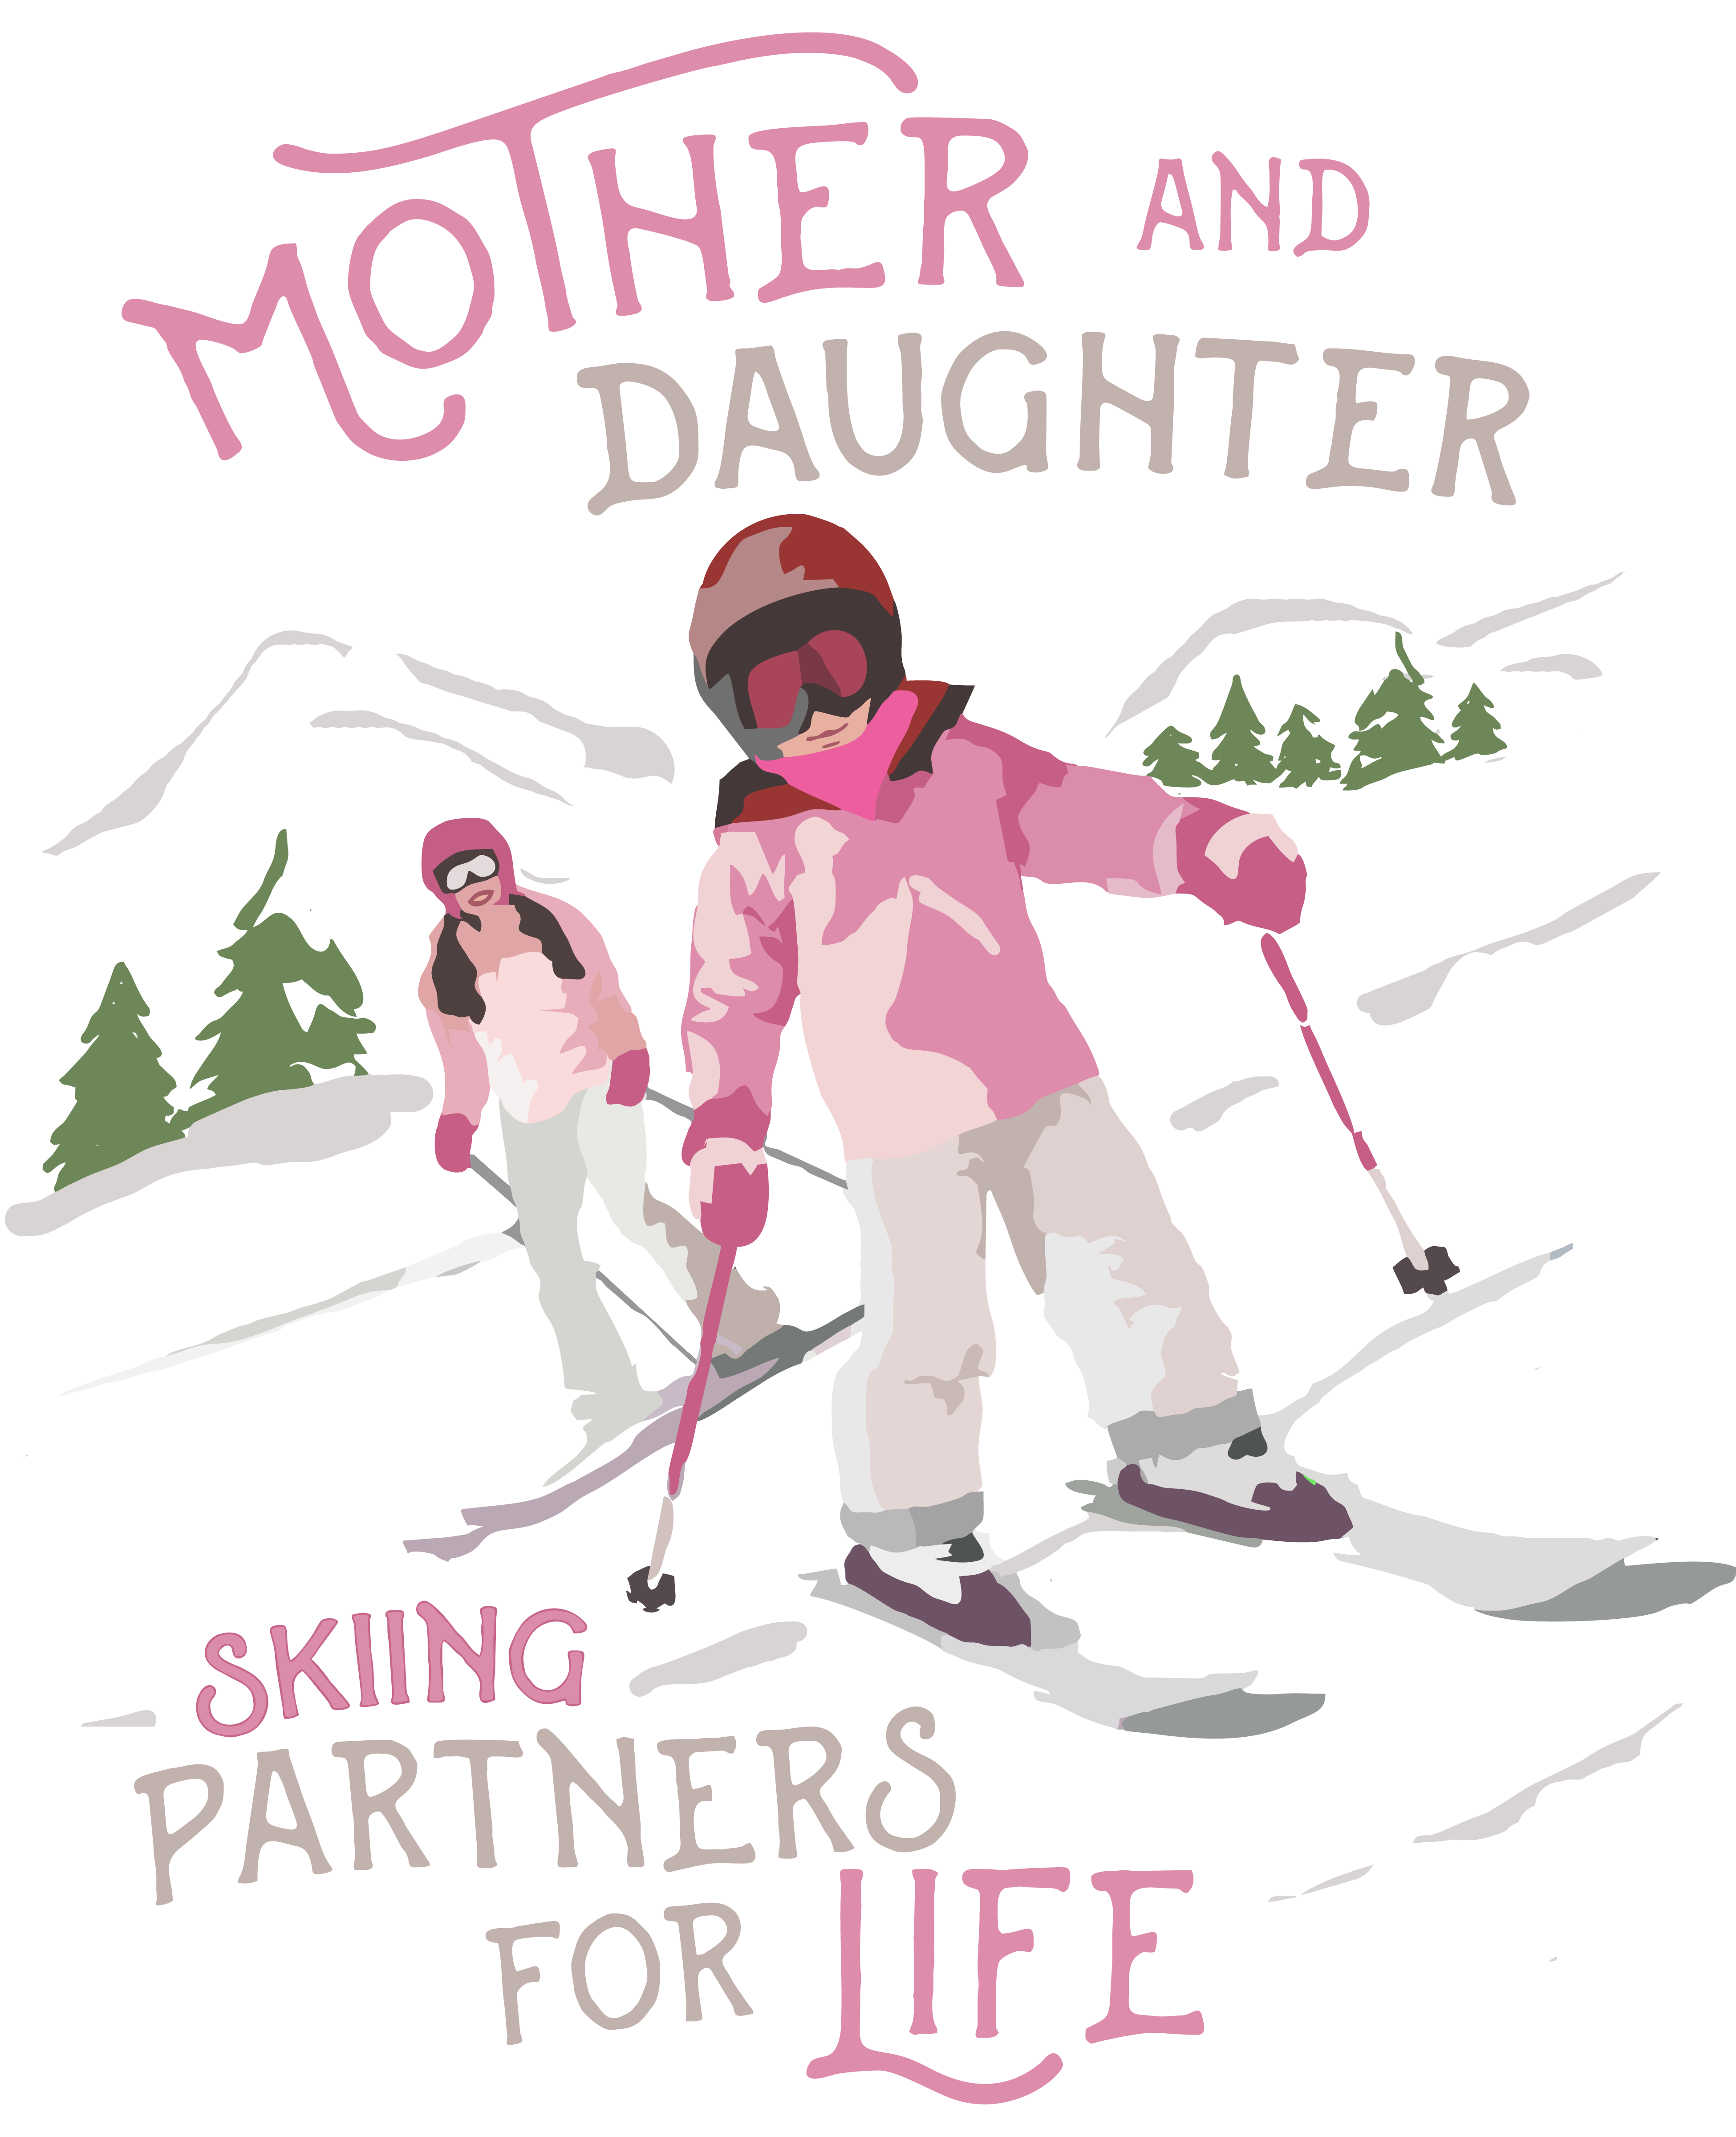 Skiing Shirts (Live to Ski & Father Son)